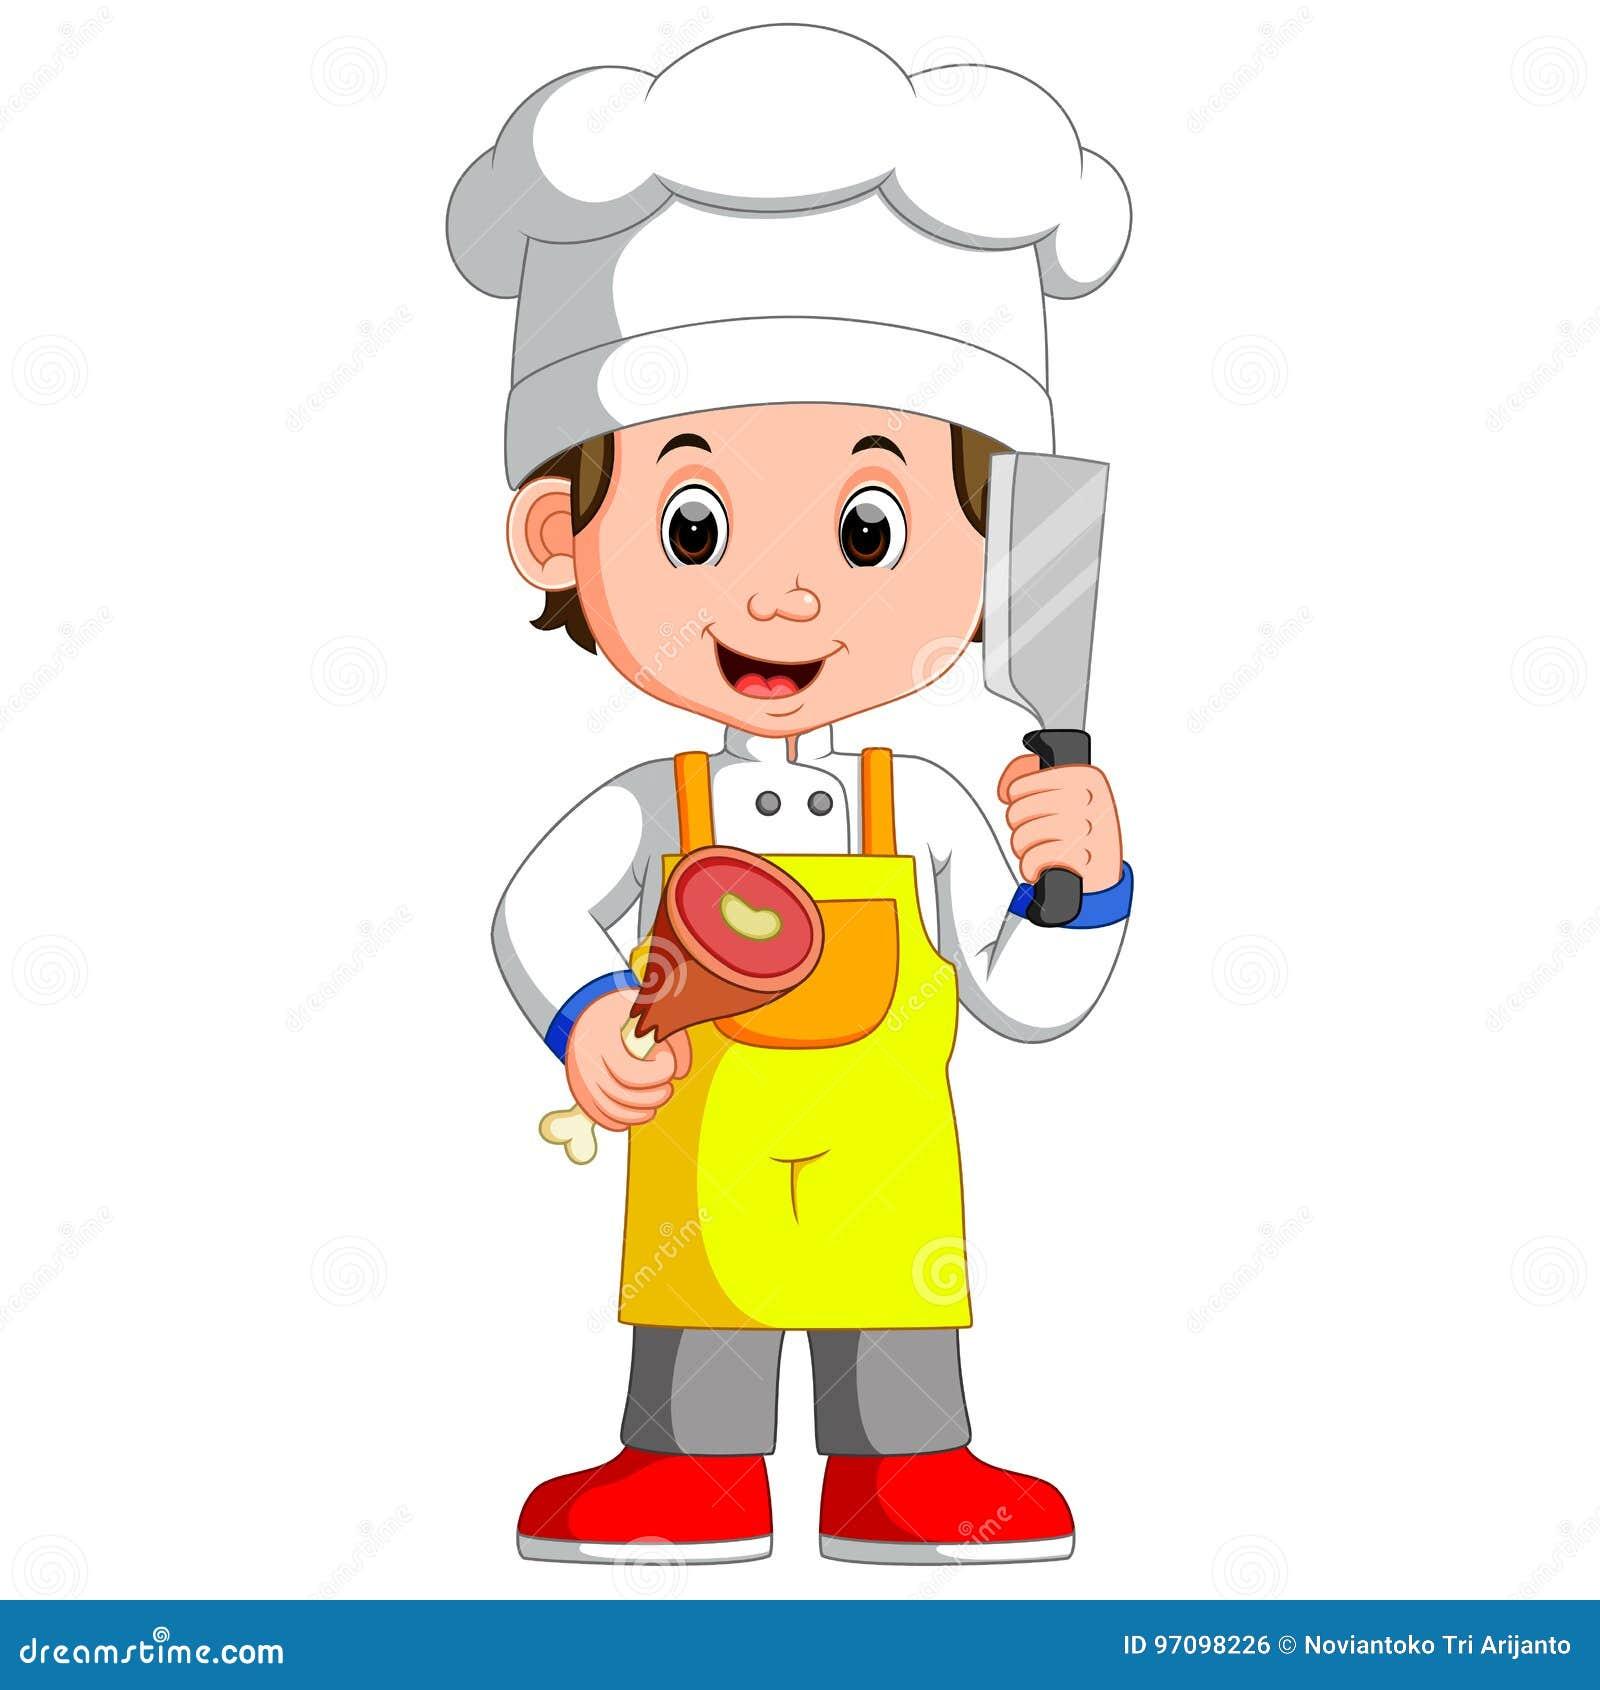 Cocinero Holding Cleaver Knife del cocinero e historieta sonriente de la carne